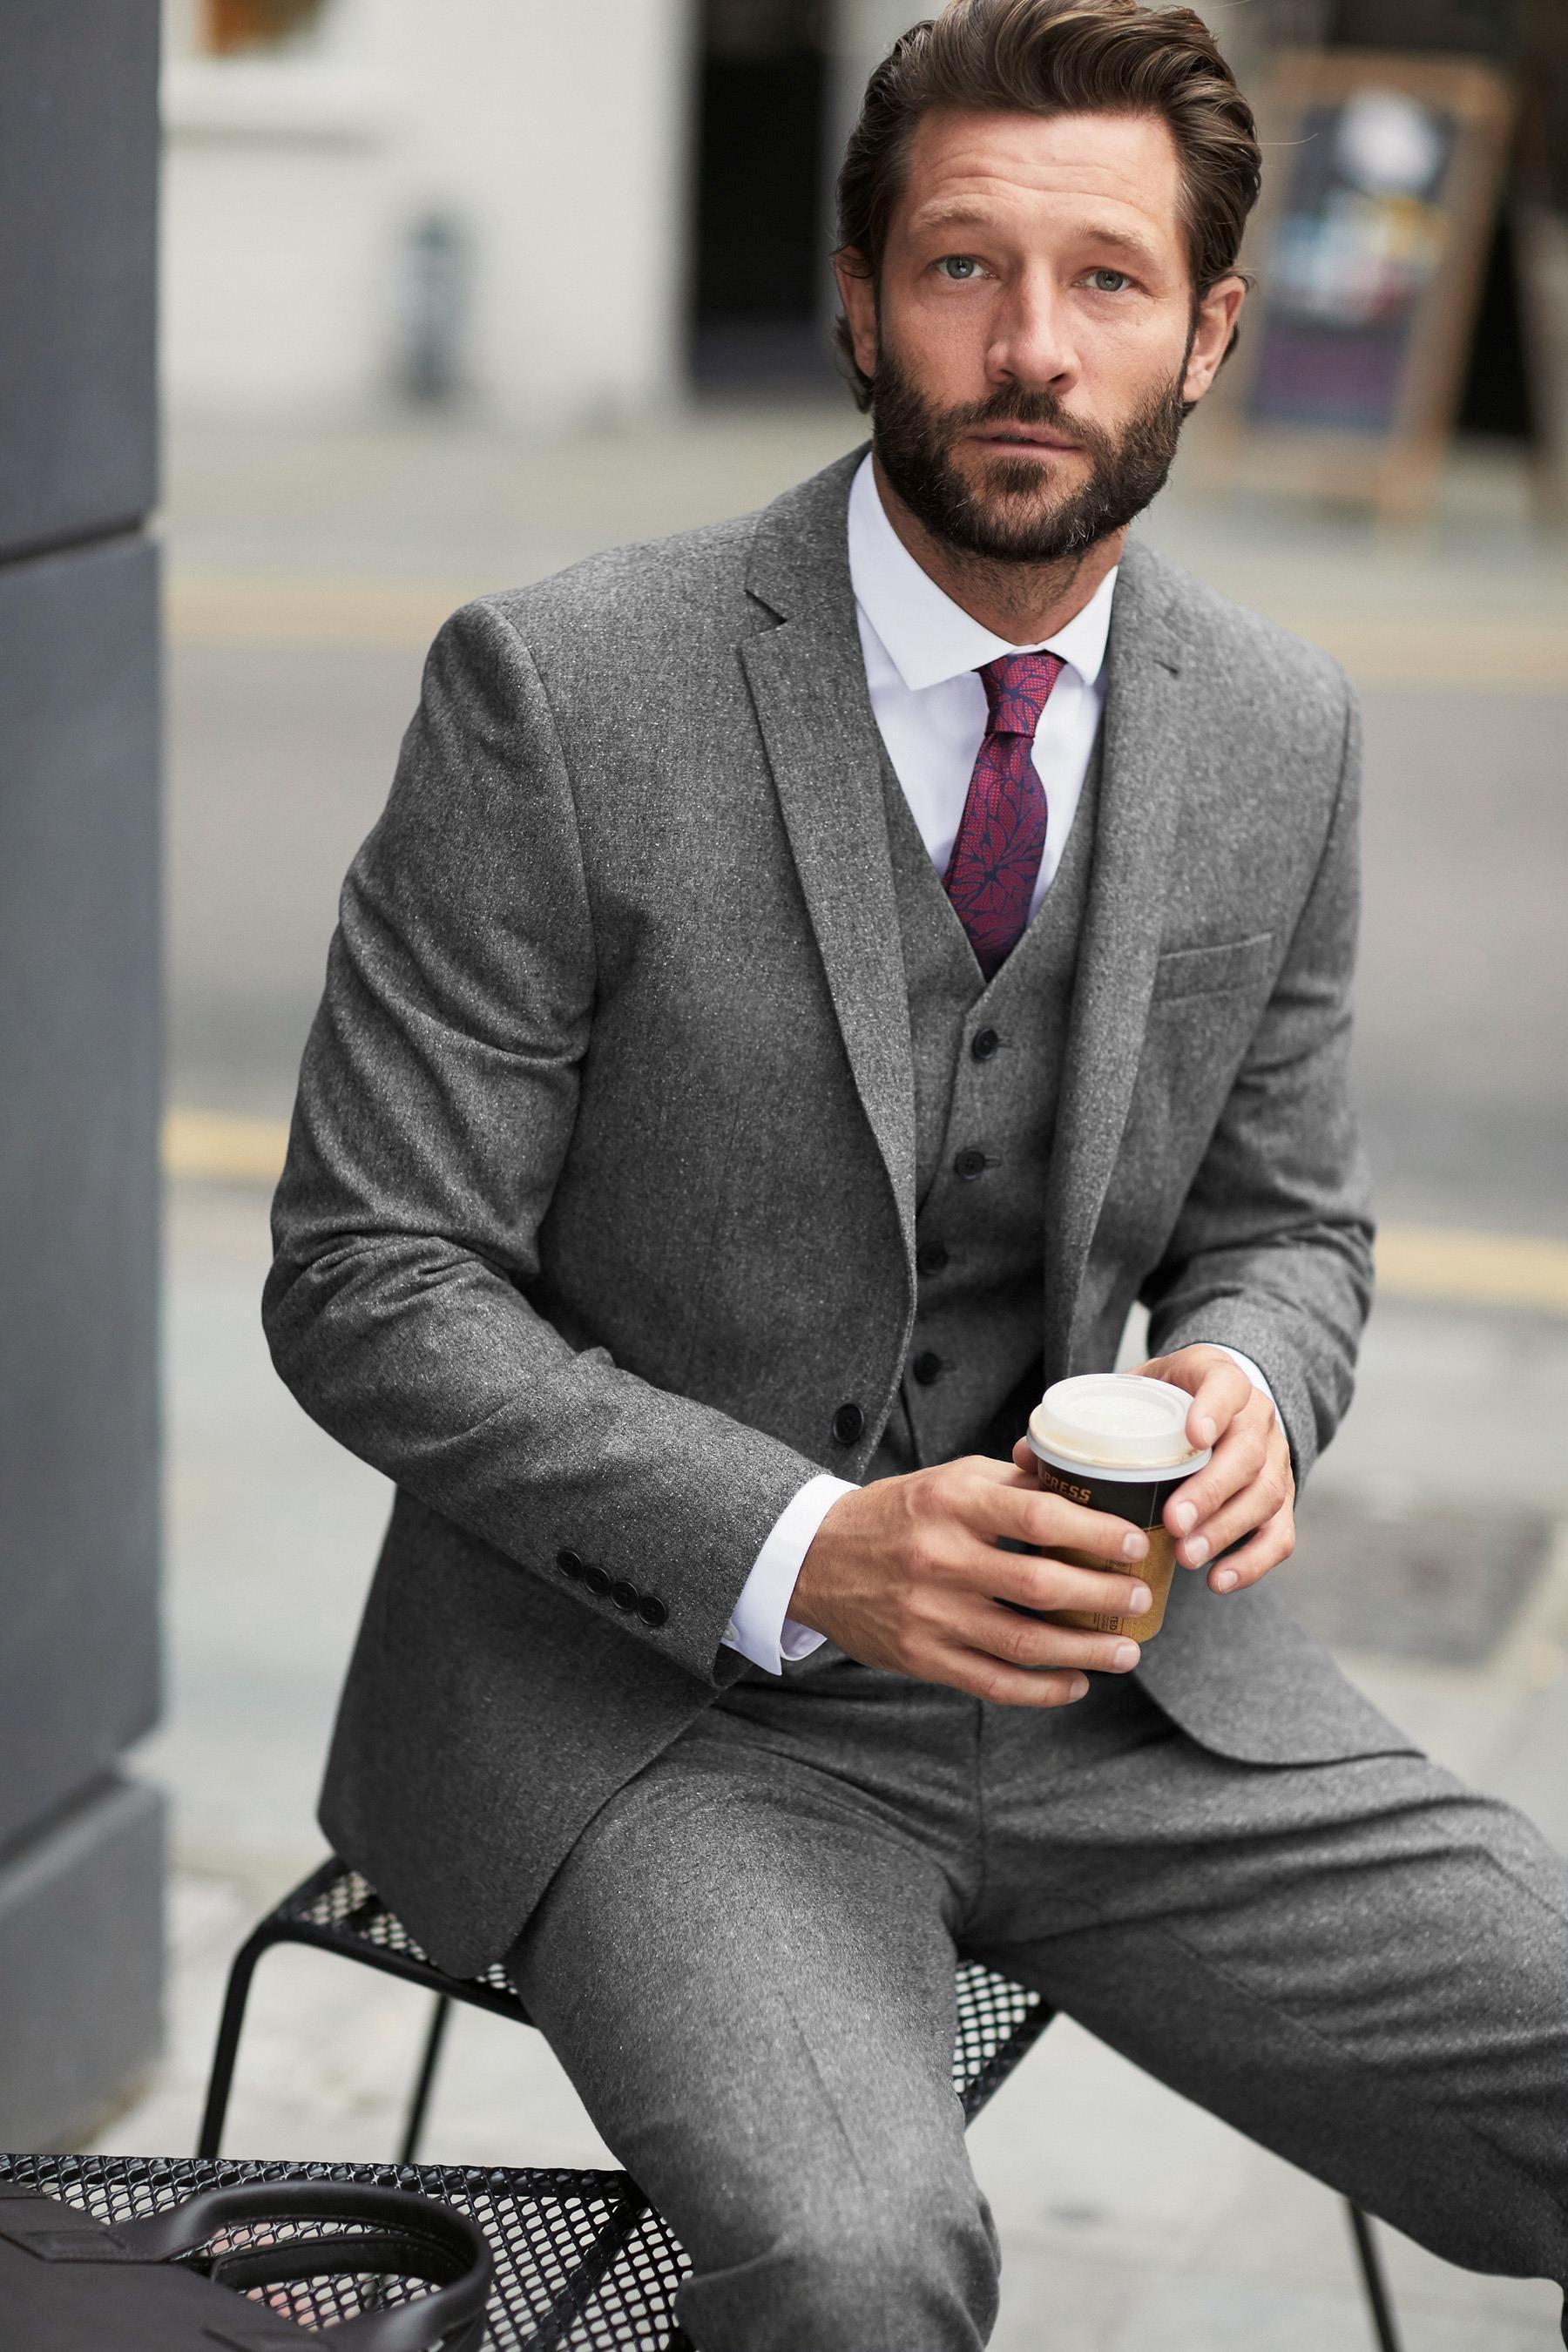 Großhandel Hohe Qualität Grau Herren Anzug Nach Maß Bräutigam Anzug ...